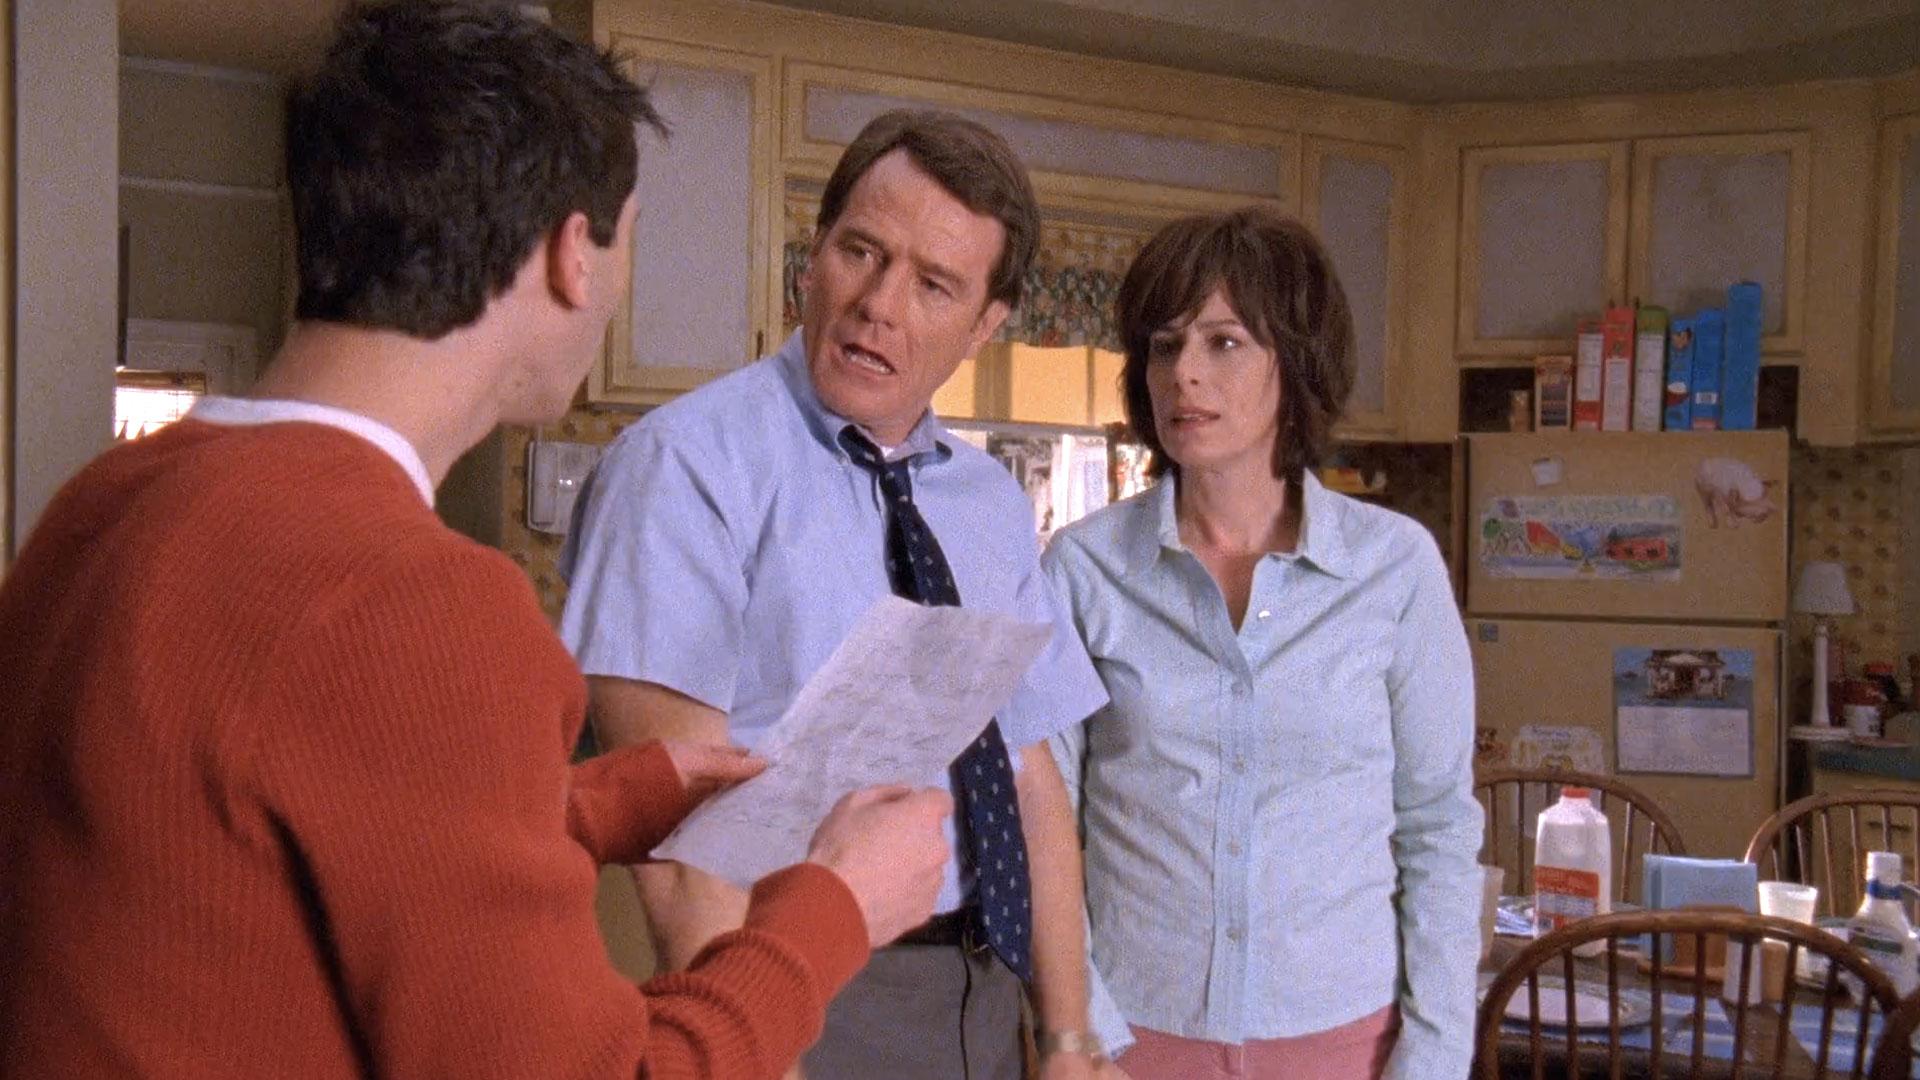 Justin Berfield (Reese), Bryan Cranston (Hal) et Jane Kaczmarek (Lois) dans